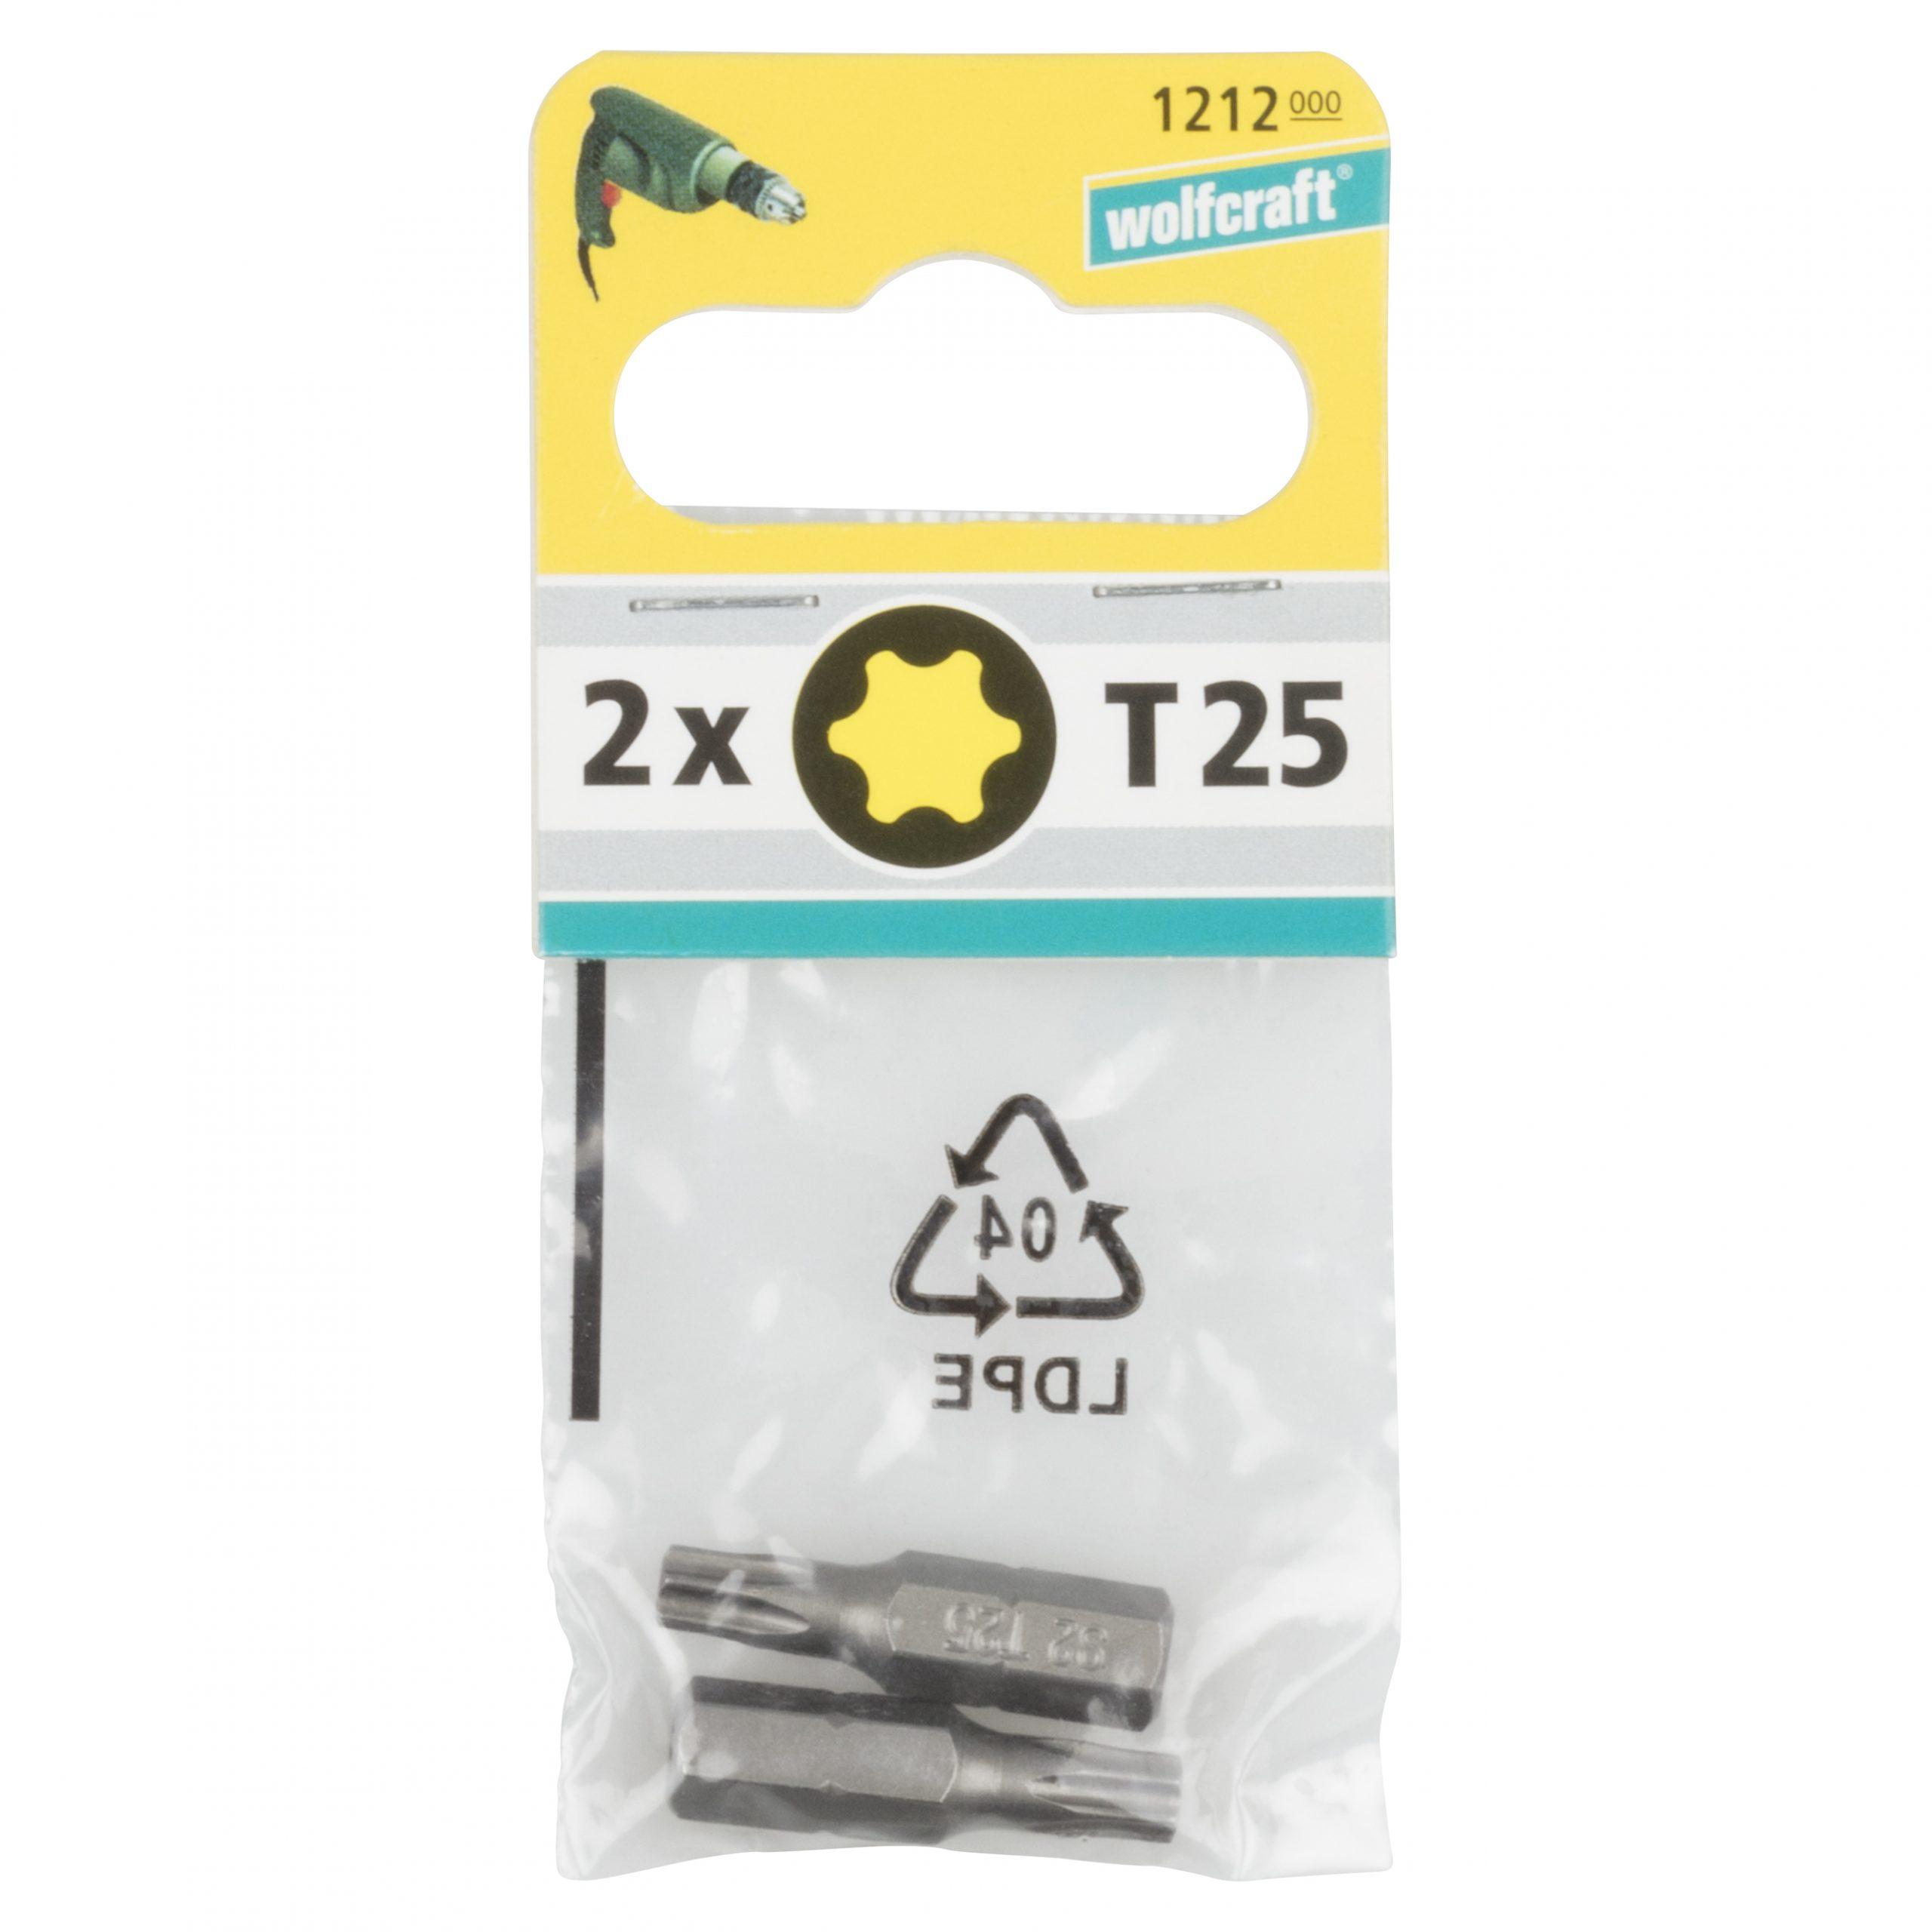 Wolfcraft Torx 2x bity, TX 25, 25mm 1212000